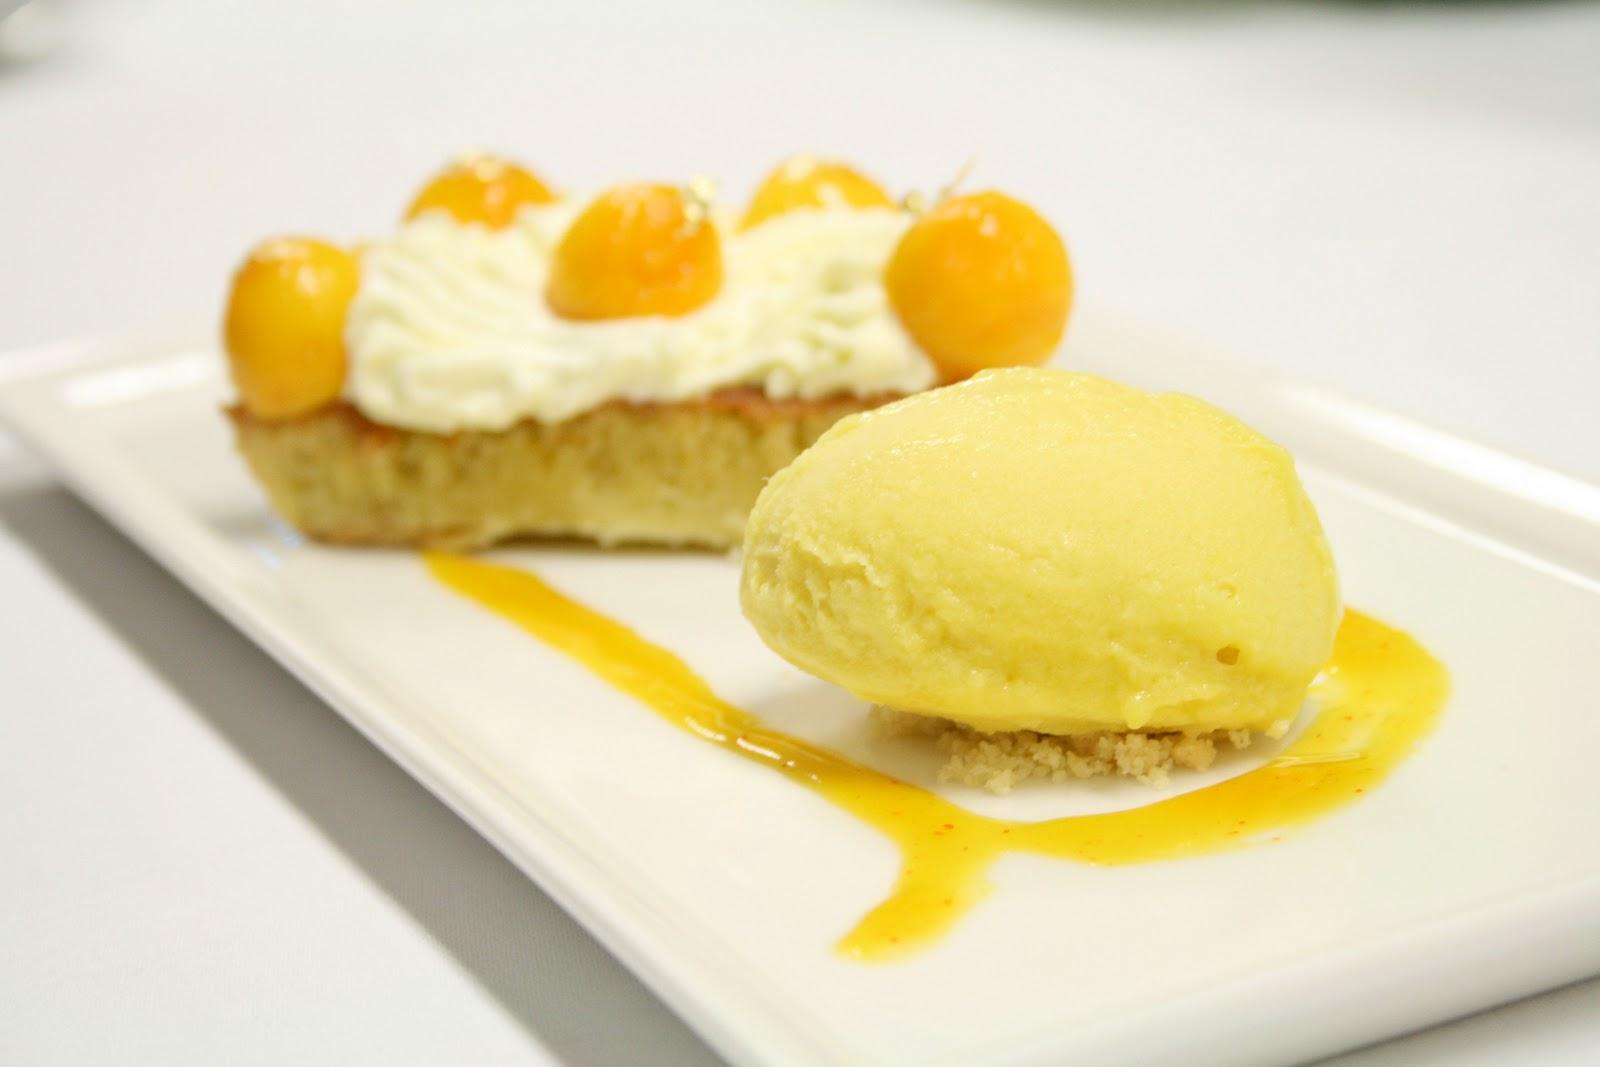 mango+tart%2C+mascarpone+cream+with+lime+zest.jpg